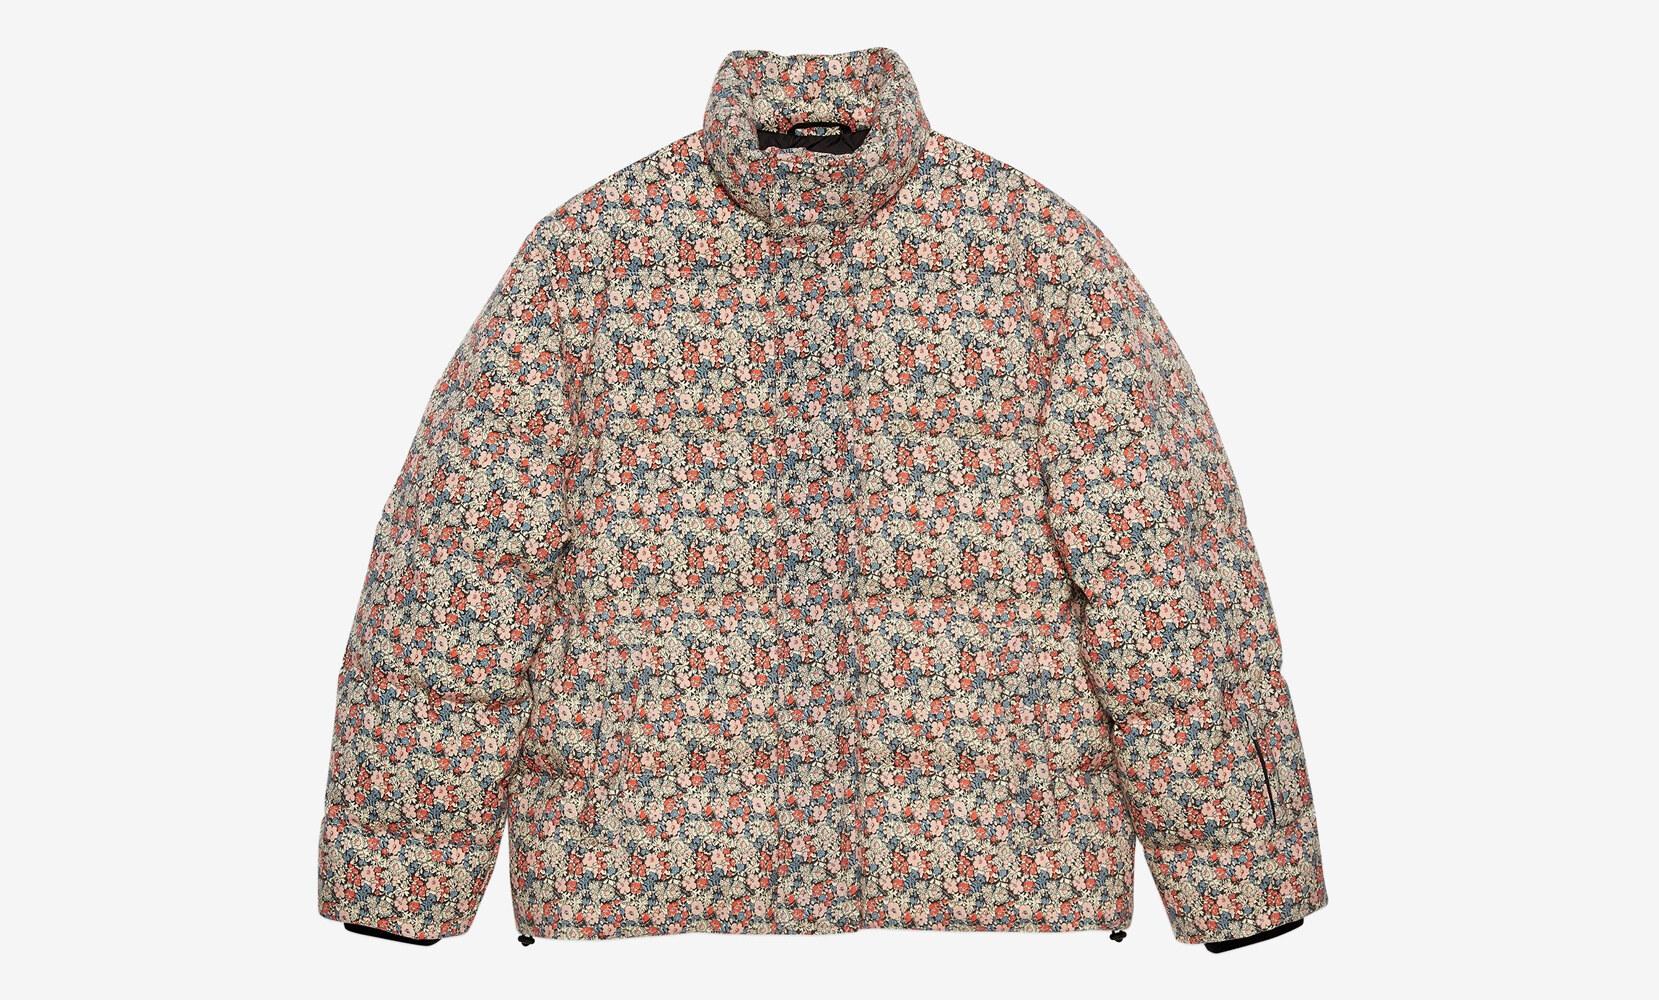 Giacca imbottita in lana a fiori Gucci Liberty